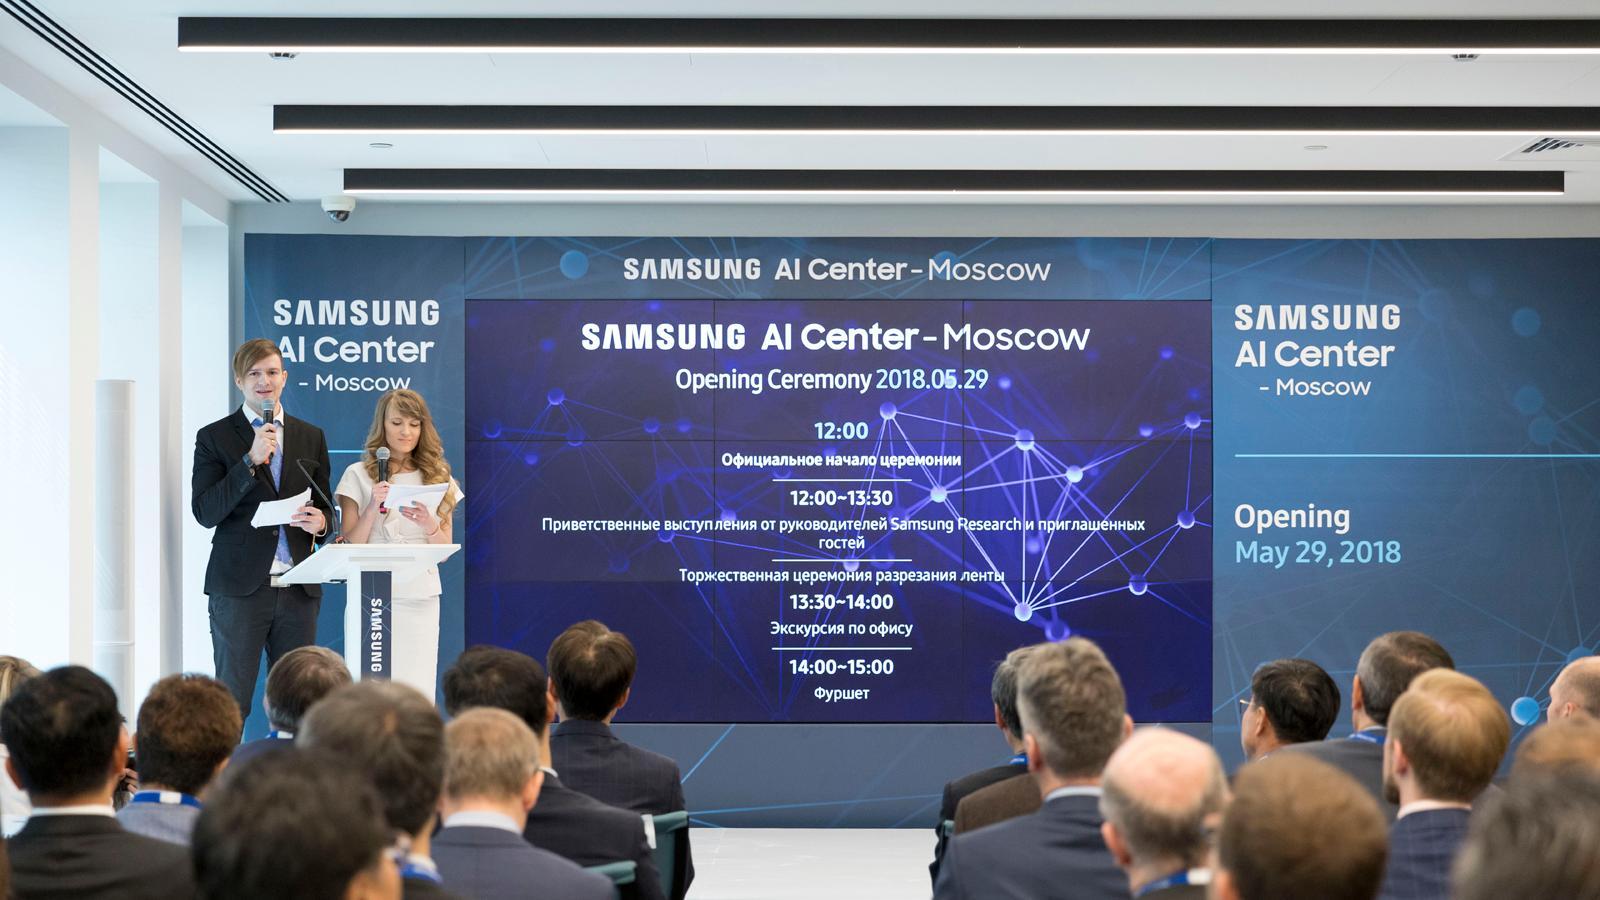 AI Center - Moscow 2